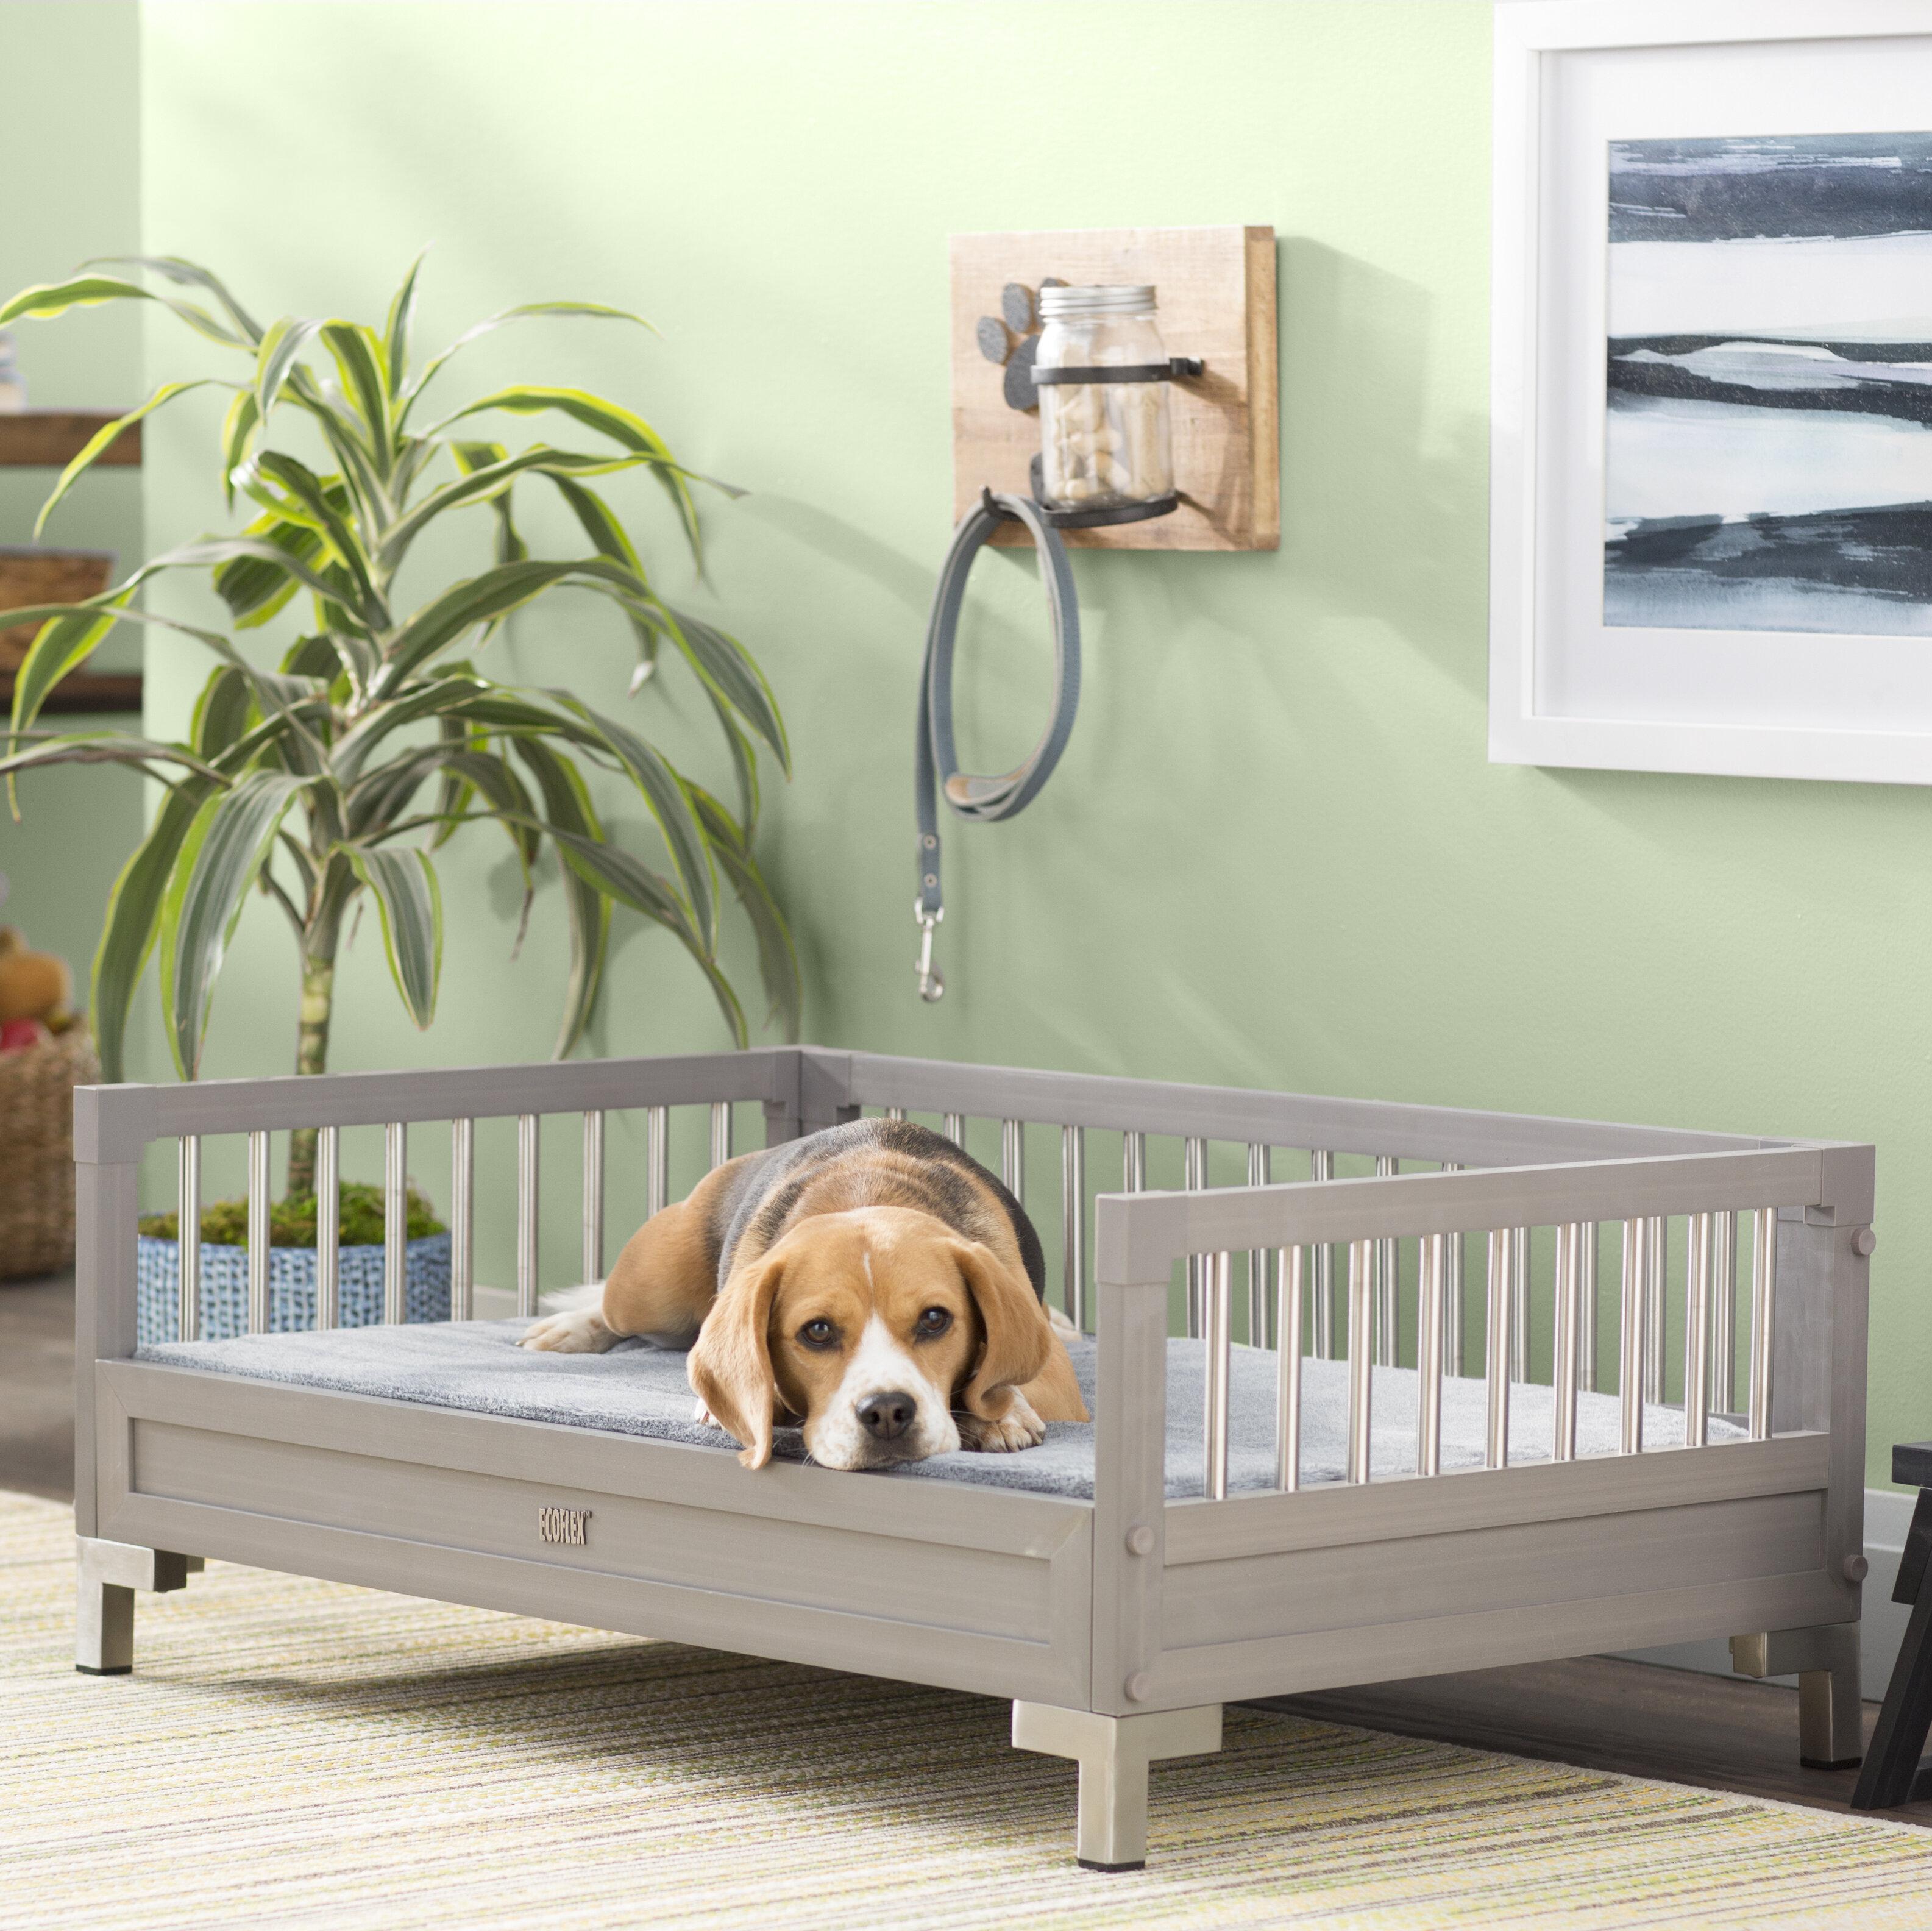 Archie Oscar Dustin Ecoflex Dog Sofa With Memory Foam Cushion Reviews Wayfair